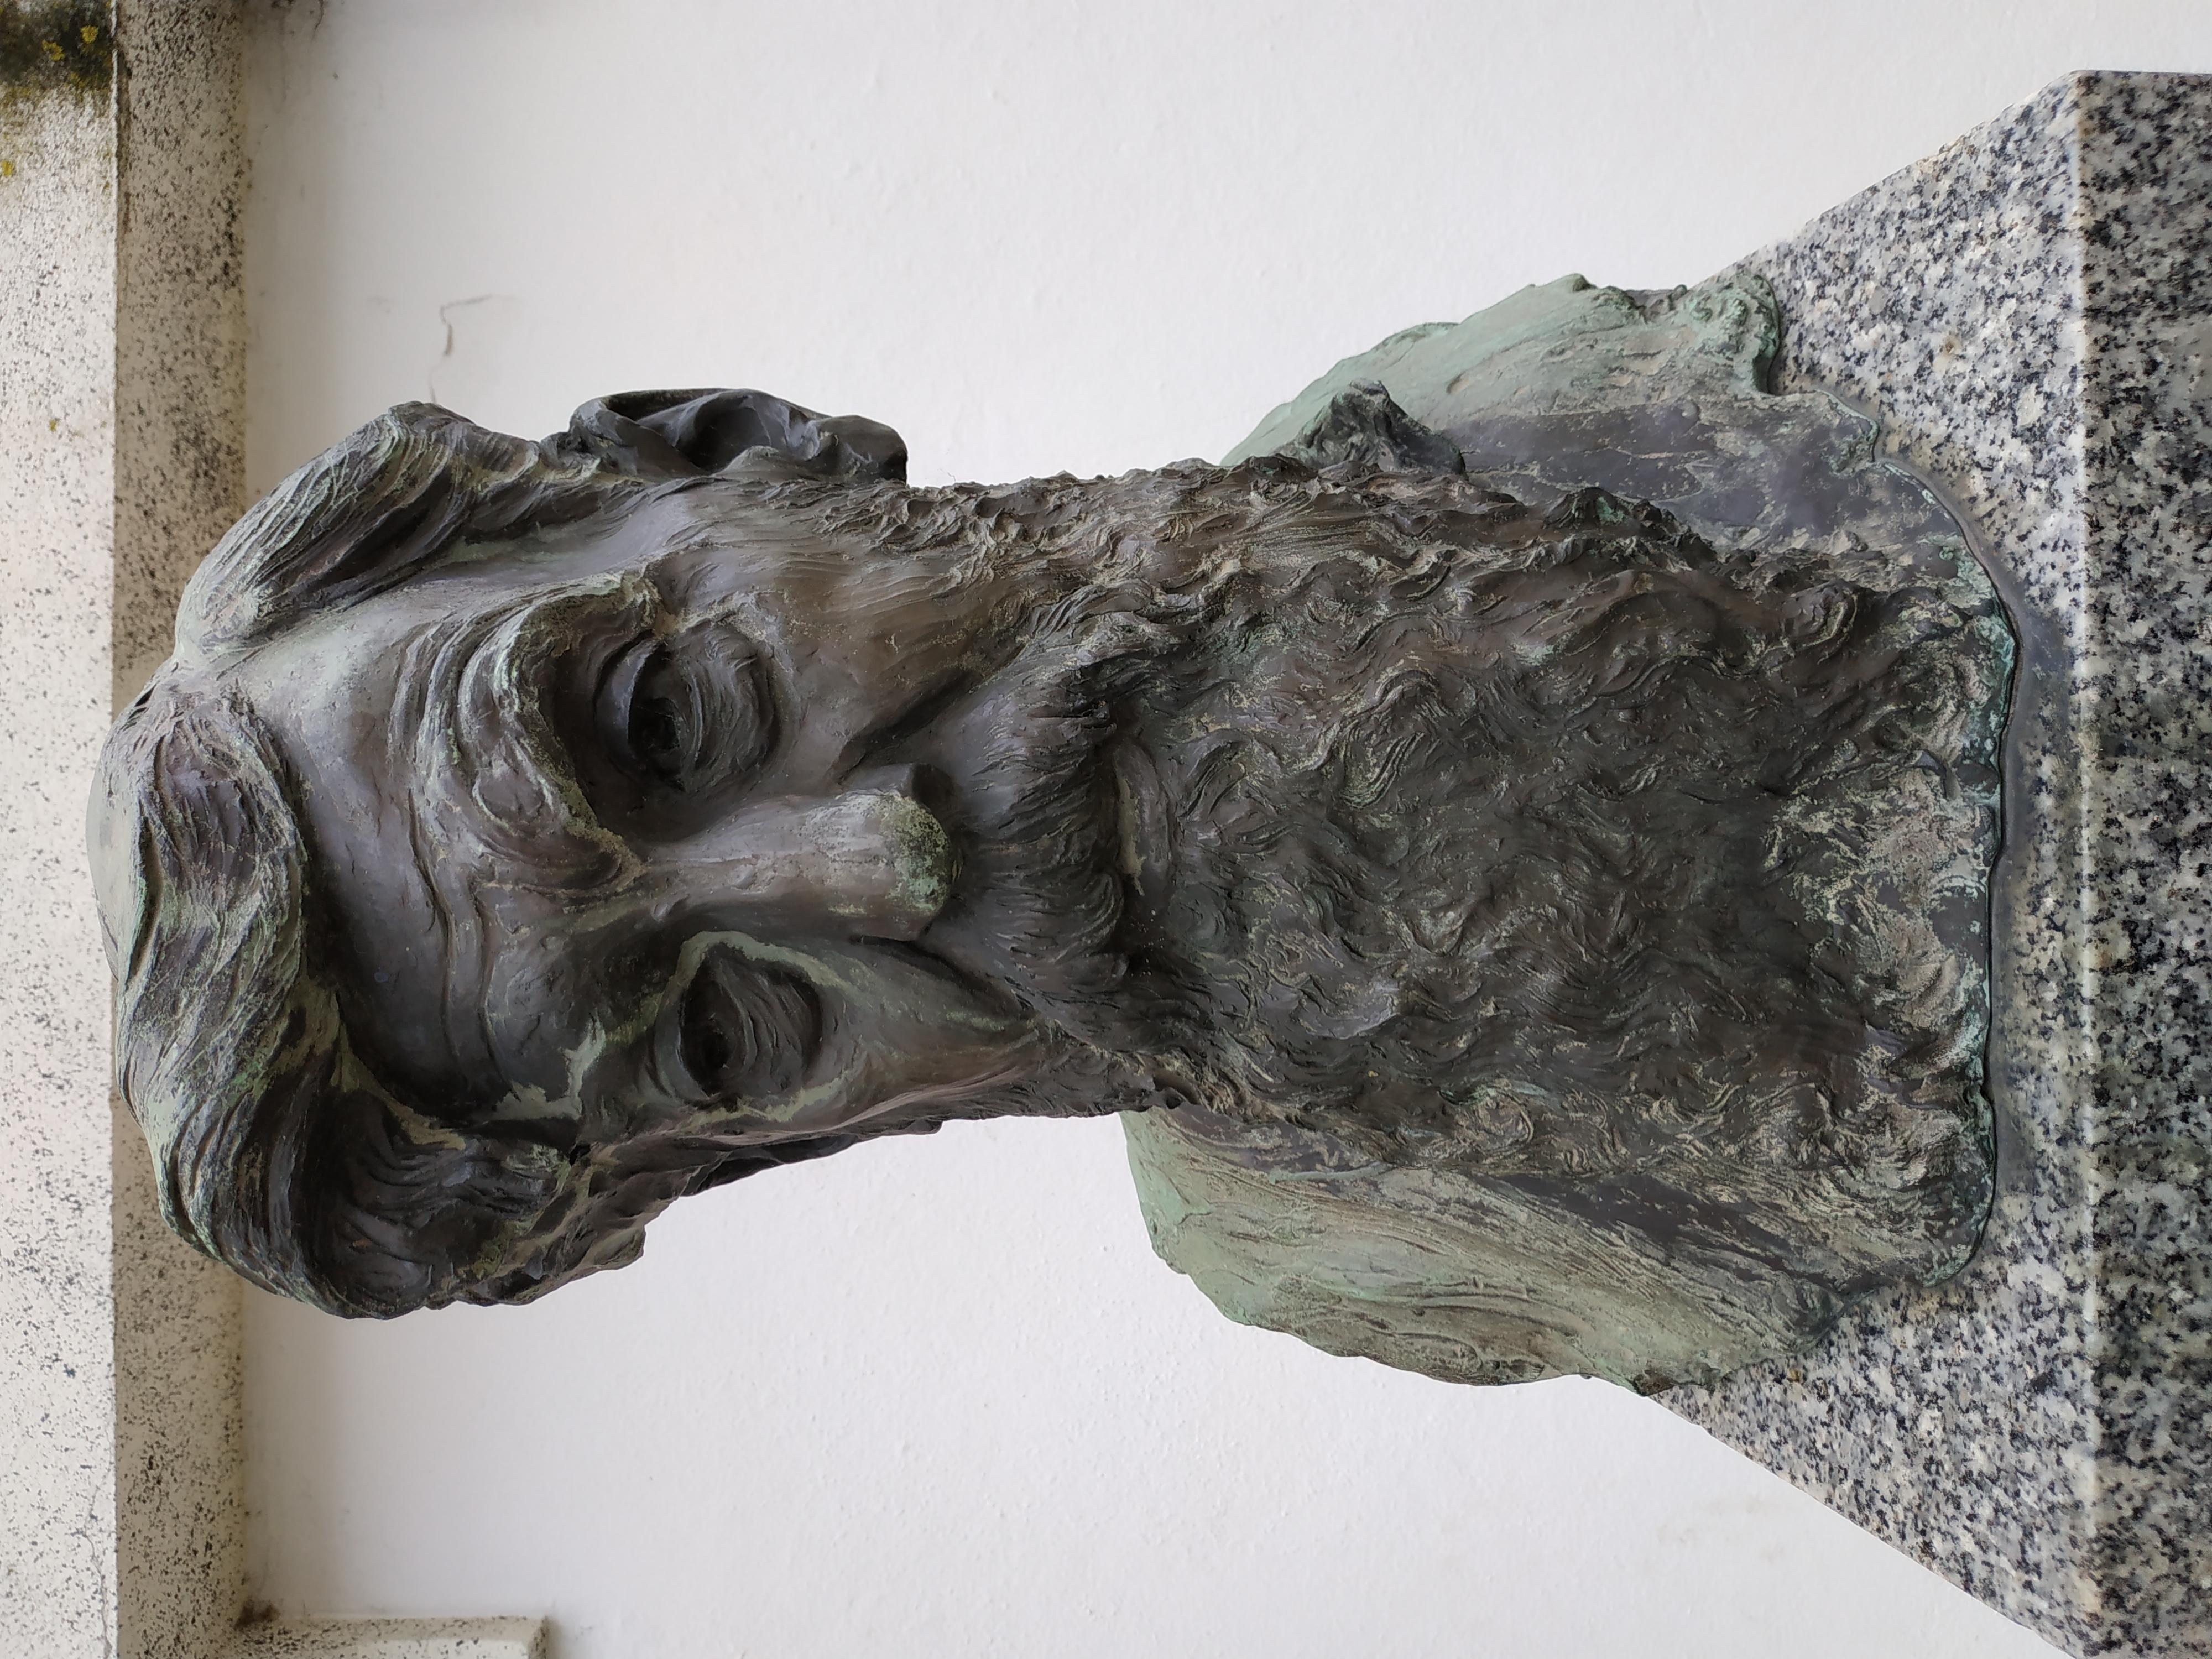 Ancient Gaia Statue file:vila nova de gaia 14 - wikimedia commons